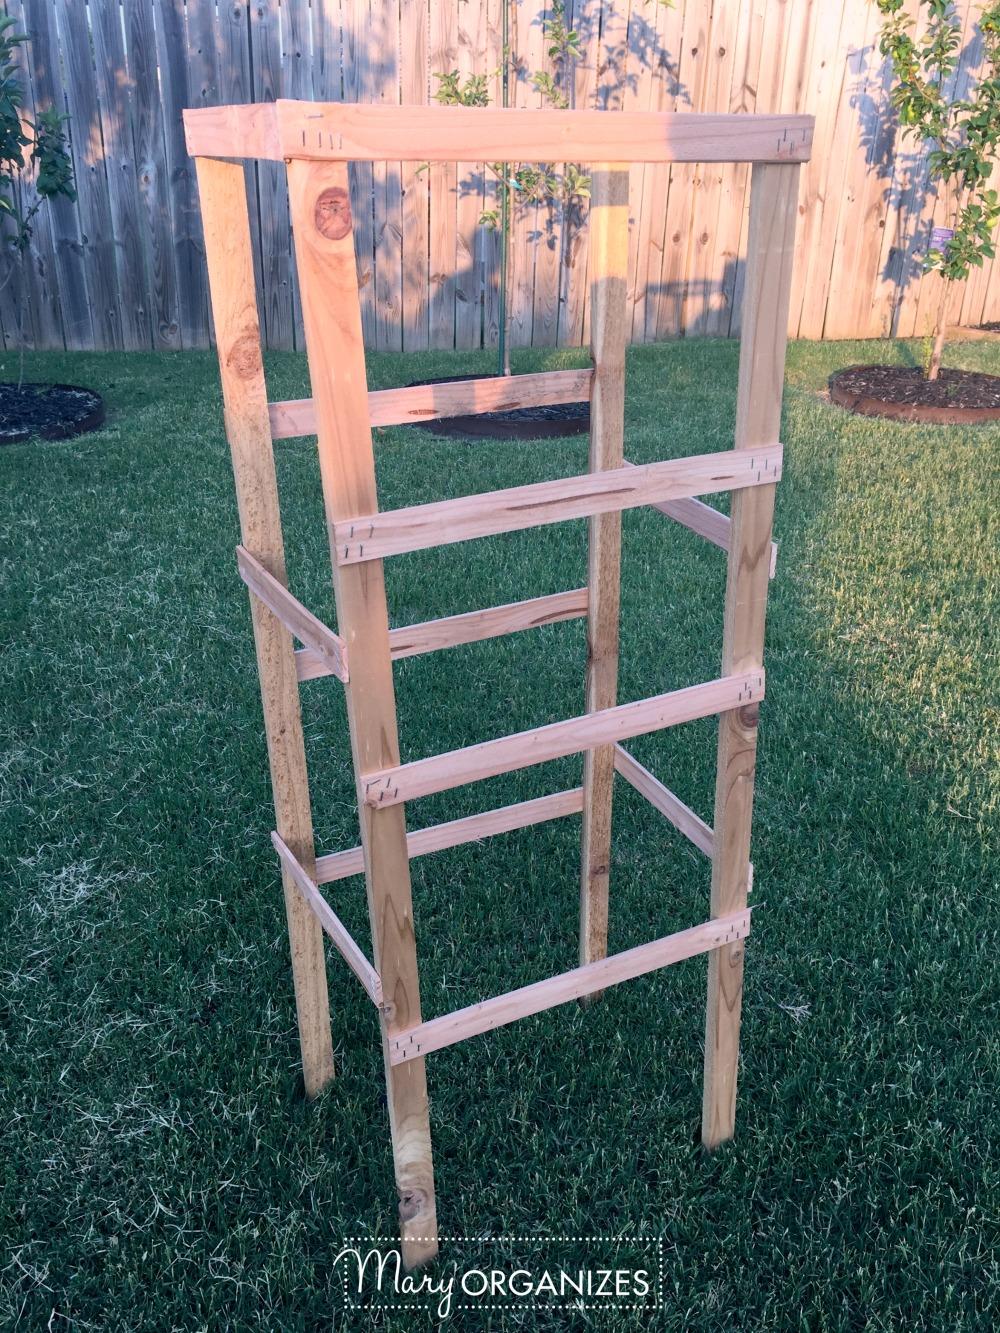 DIY Tomato Cage Tutorial for the Organic Garden